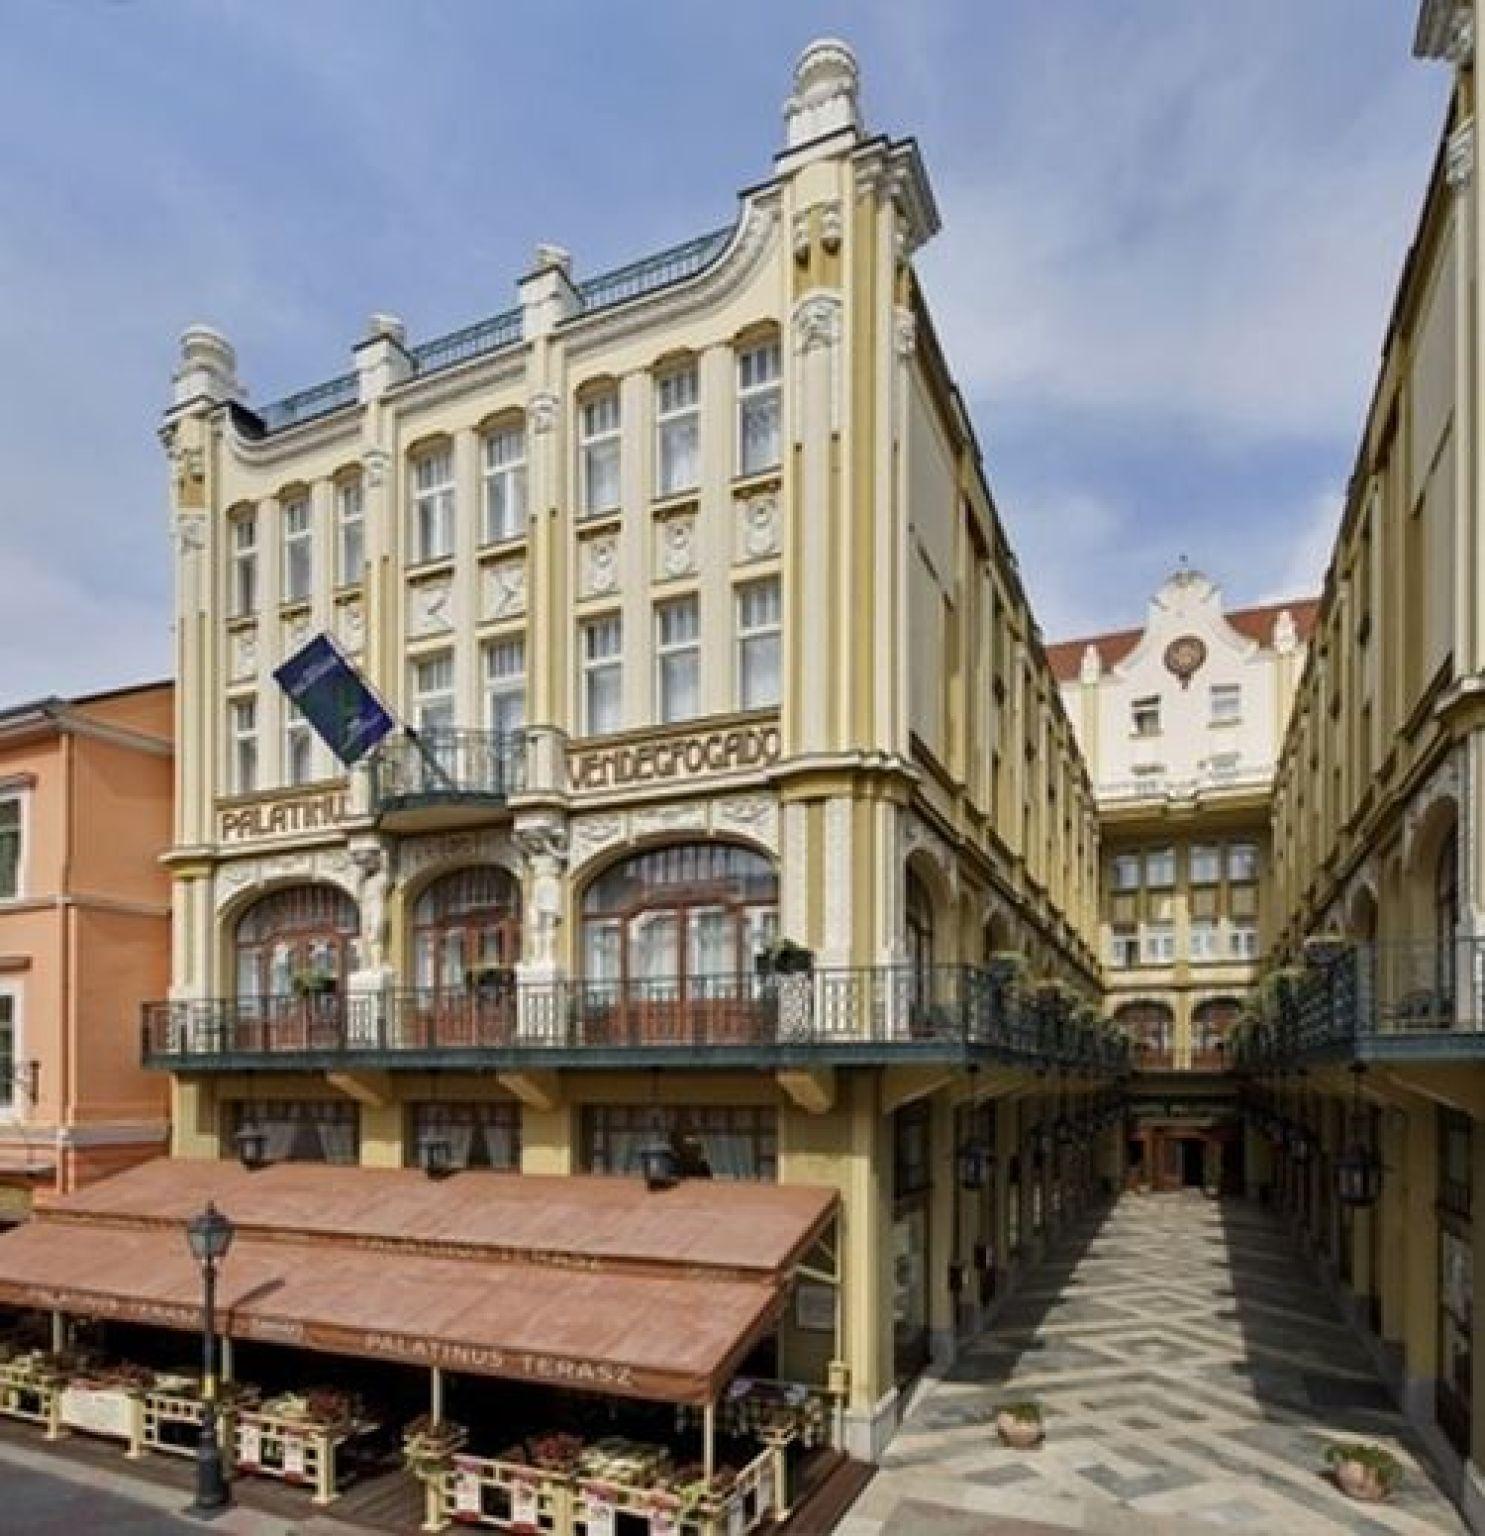 Hotel Palatinus City Center Pécs - Hotel Palatinus